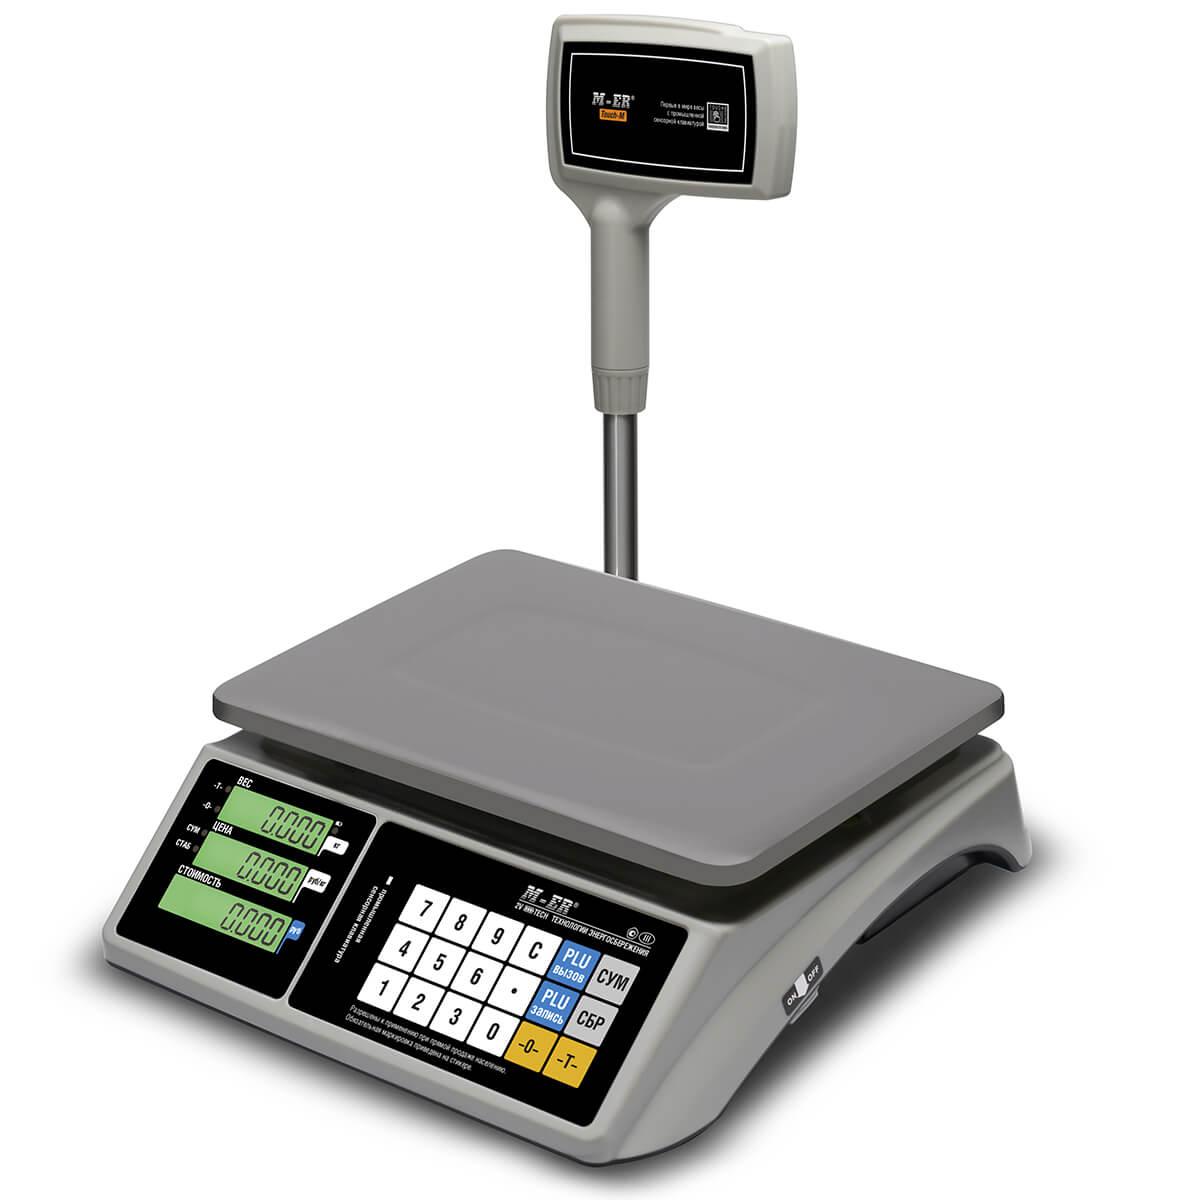 Торговые настольные весы M-ER 328 ACPX-32.5 «TOUCH-M» LCD